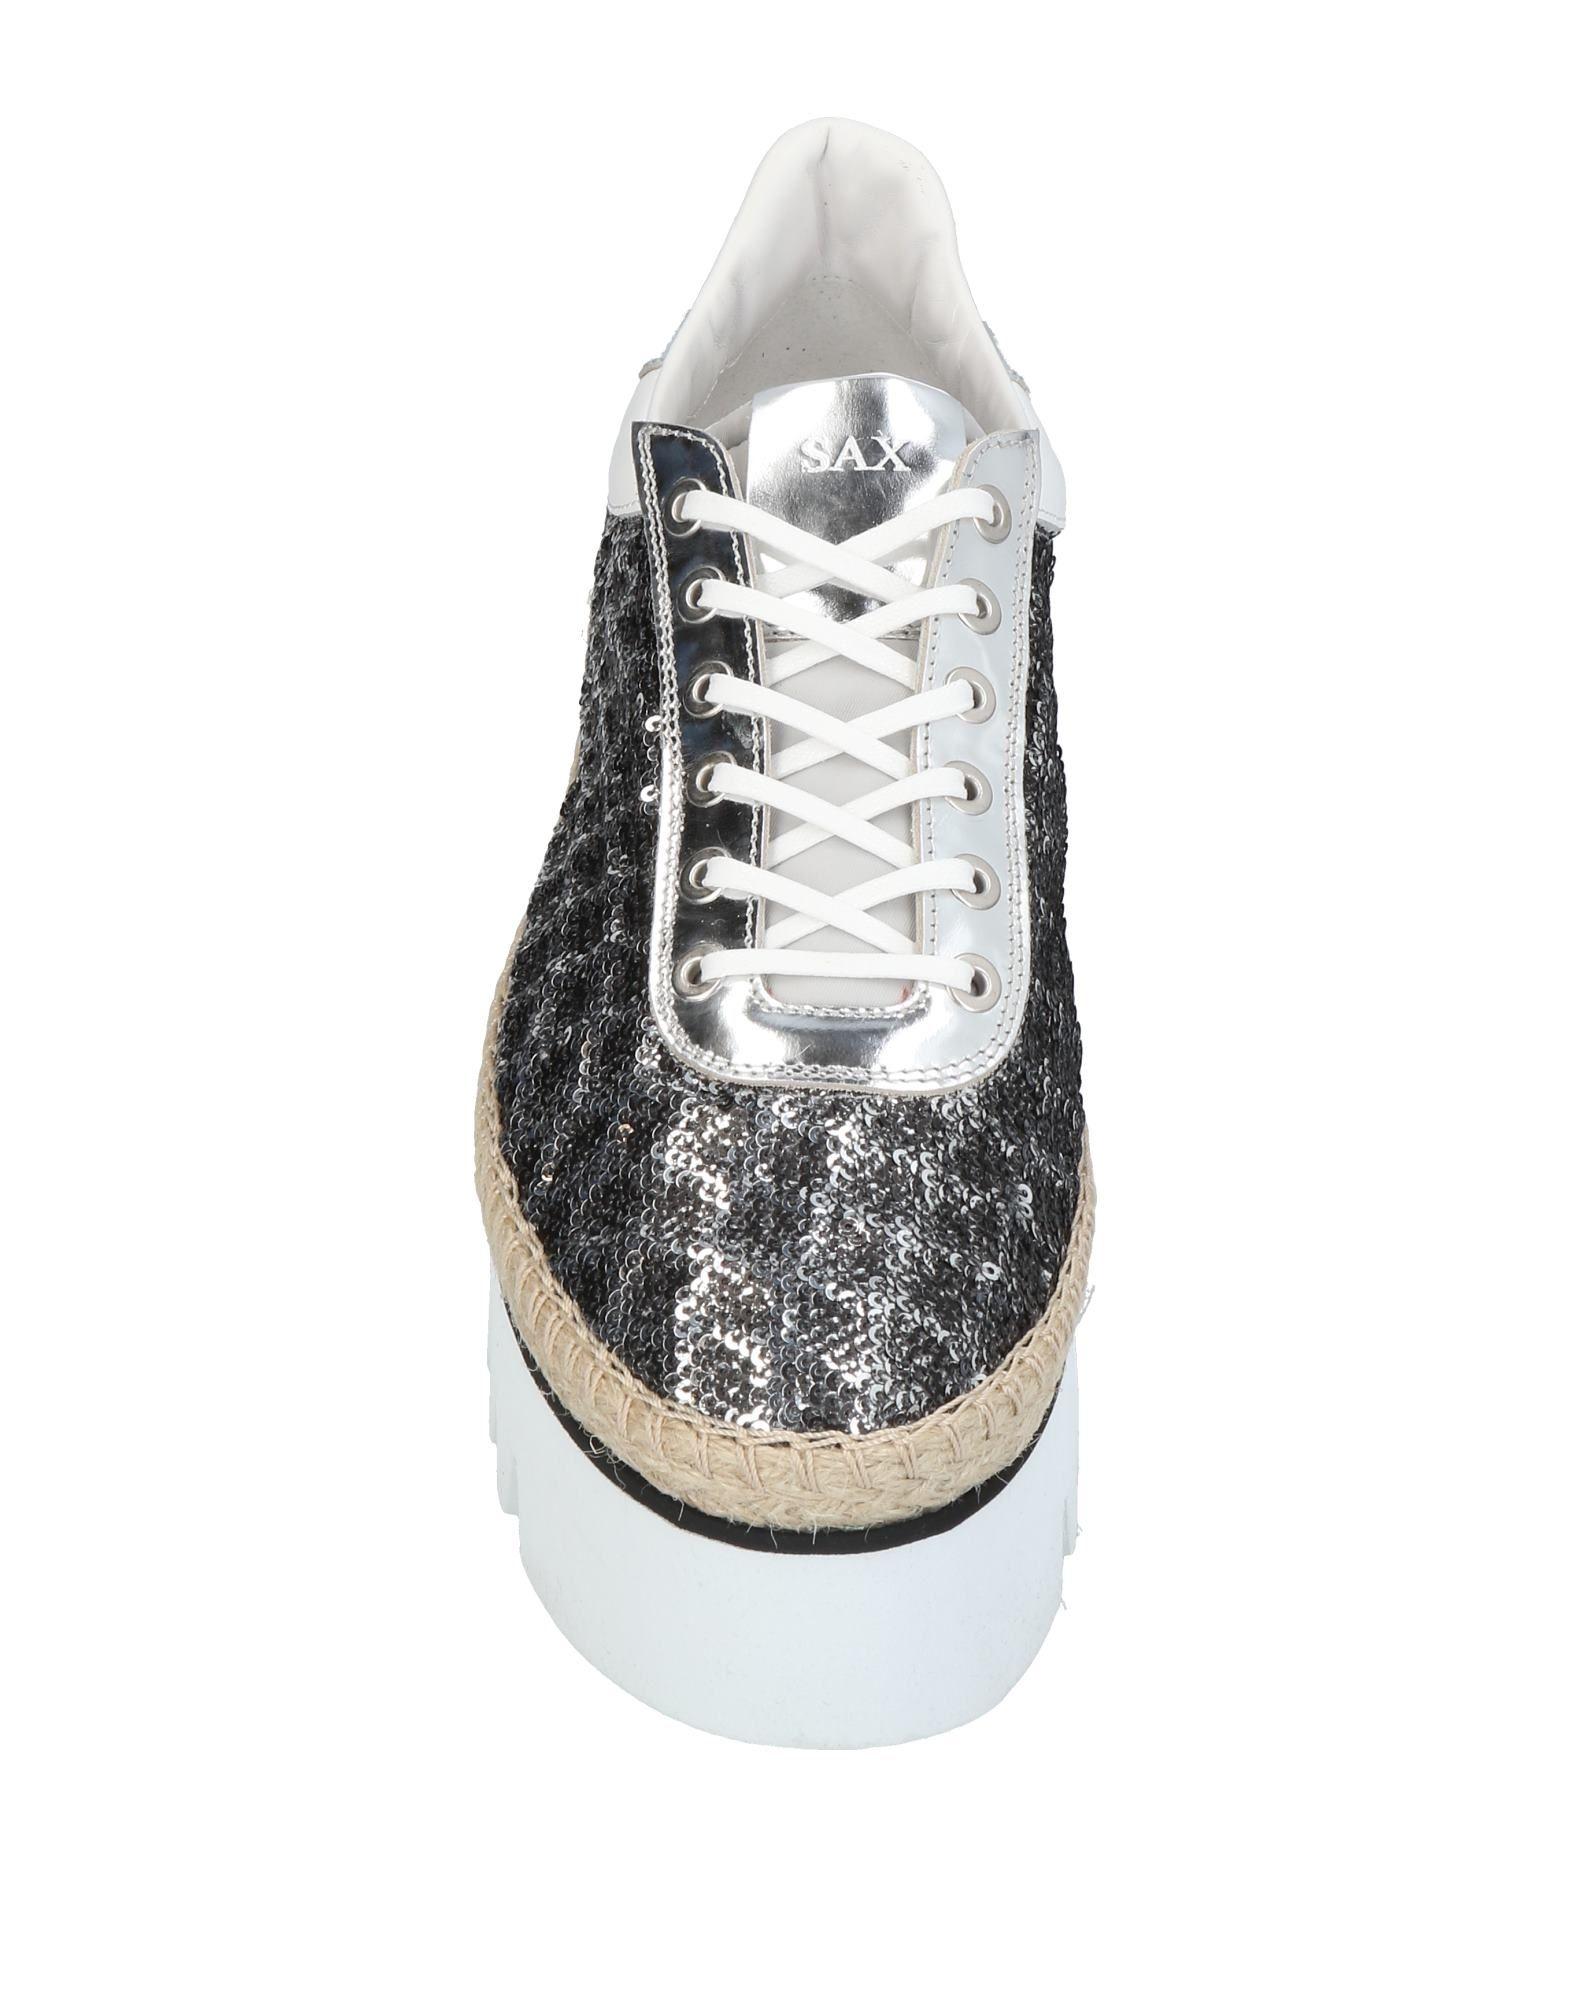 Sax Sneakers 11416288PQ Damen  11416288PQ Sneakers Heiße Schuhe 945241